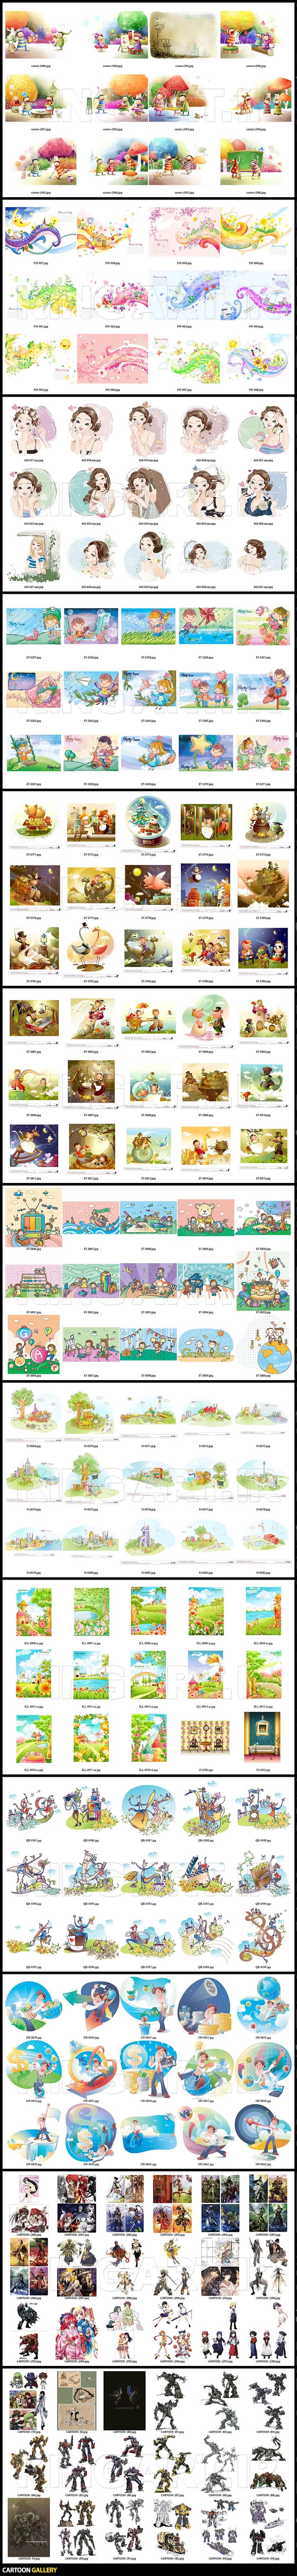 Cartoon Gallery فایل های لایه باز کارتونی ( عکس های کارتونی - تصویر کارتونی شخصیت های کارتونی )